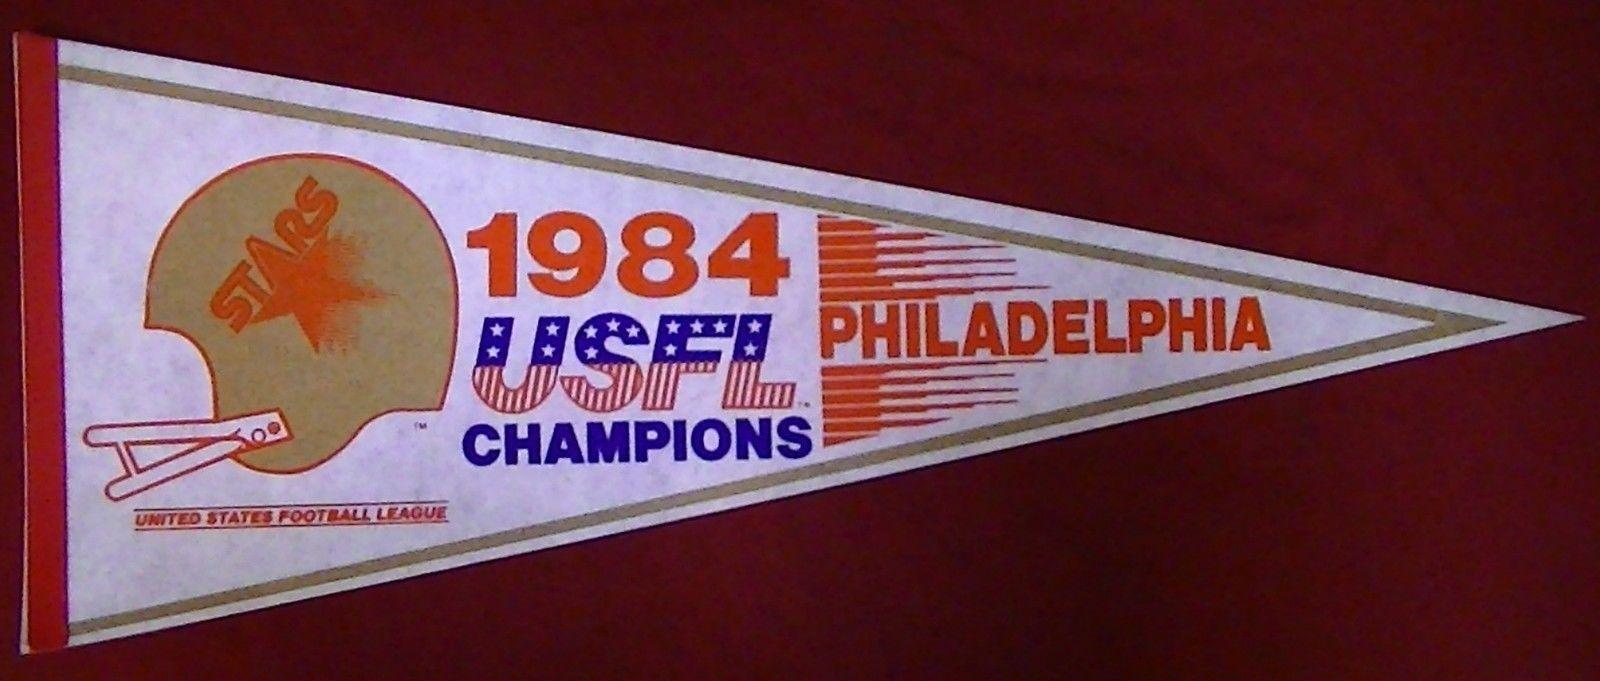 199495 PHILADELPHIA FLYERS REVISED LEGENDS SPORTS BAR